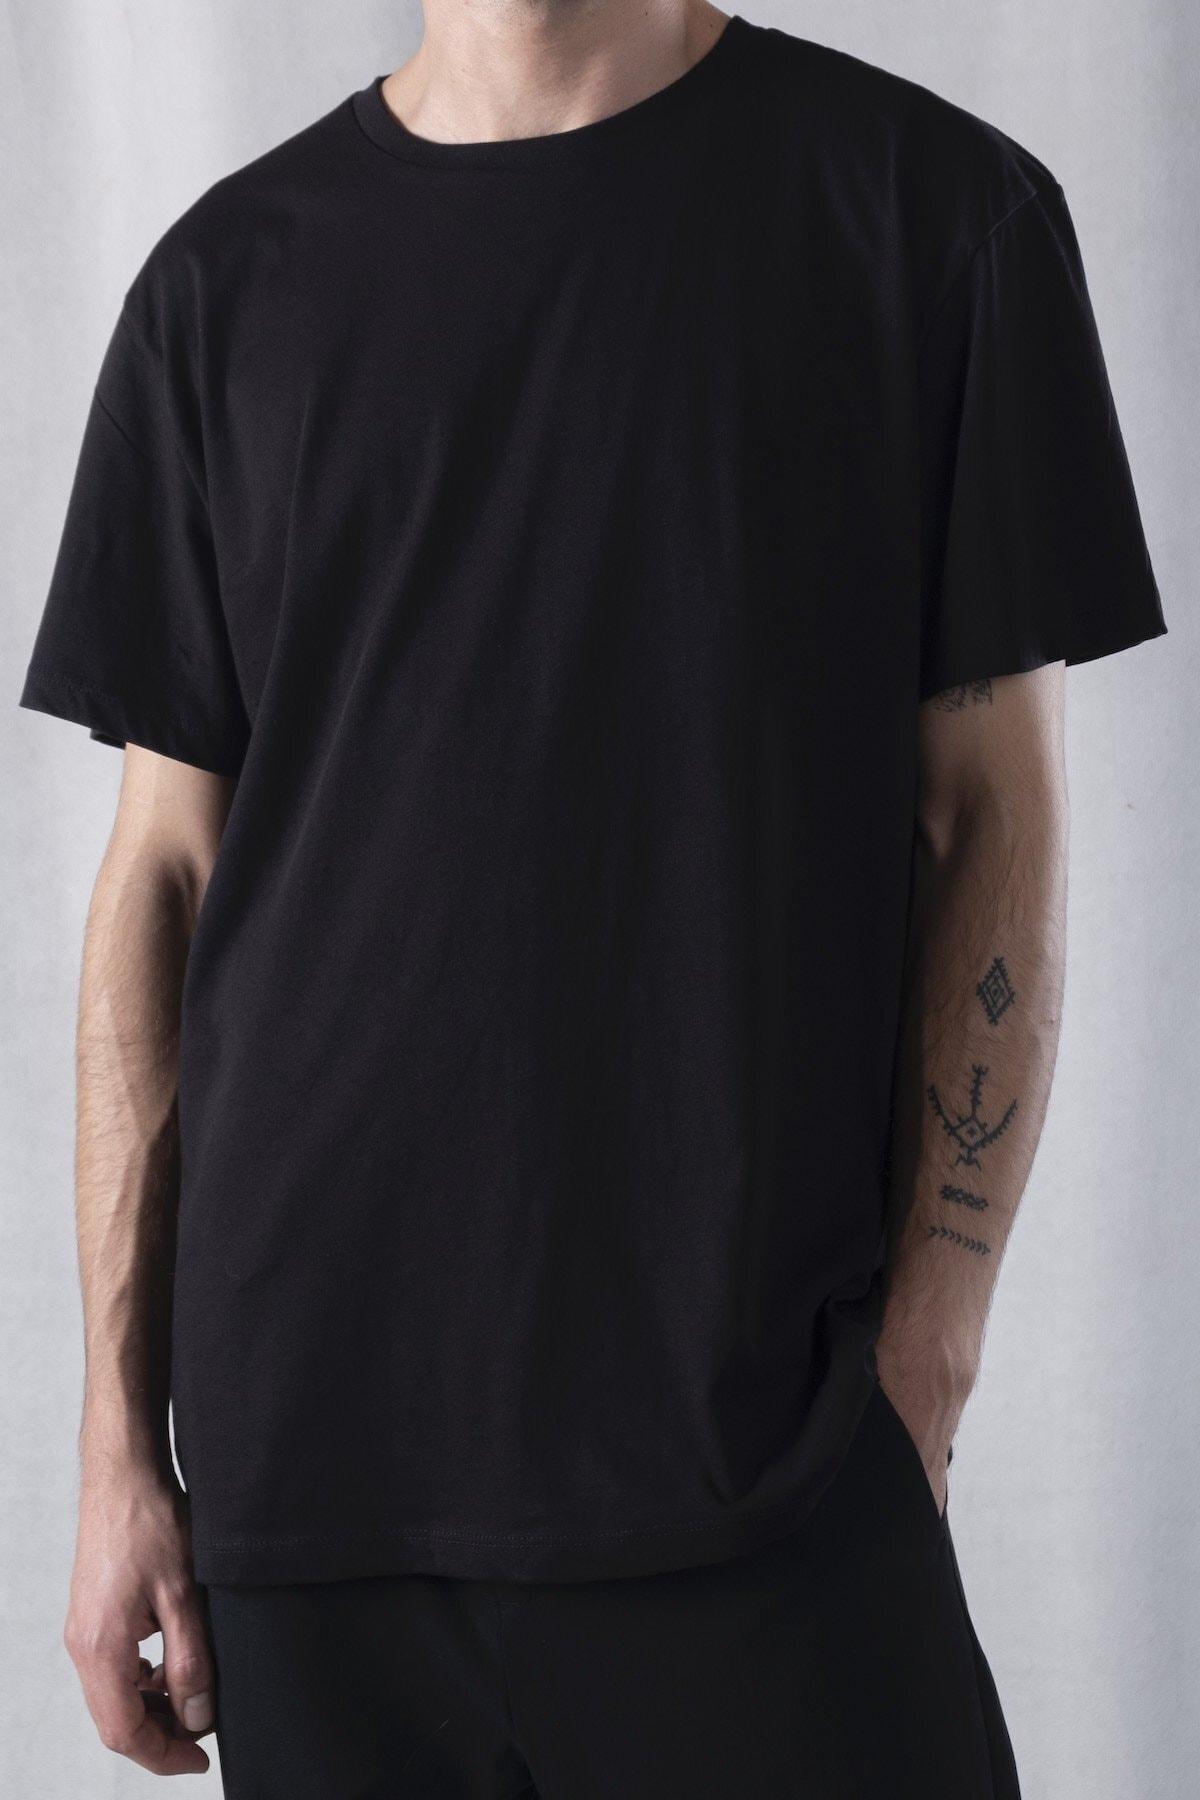 tinbasic Erkek Siyah Sırt Detaylı %100 Pamuk Örmek Bisiklet Yaka Oversize T-shirt 2